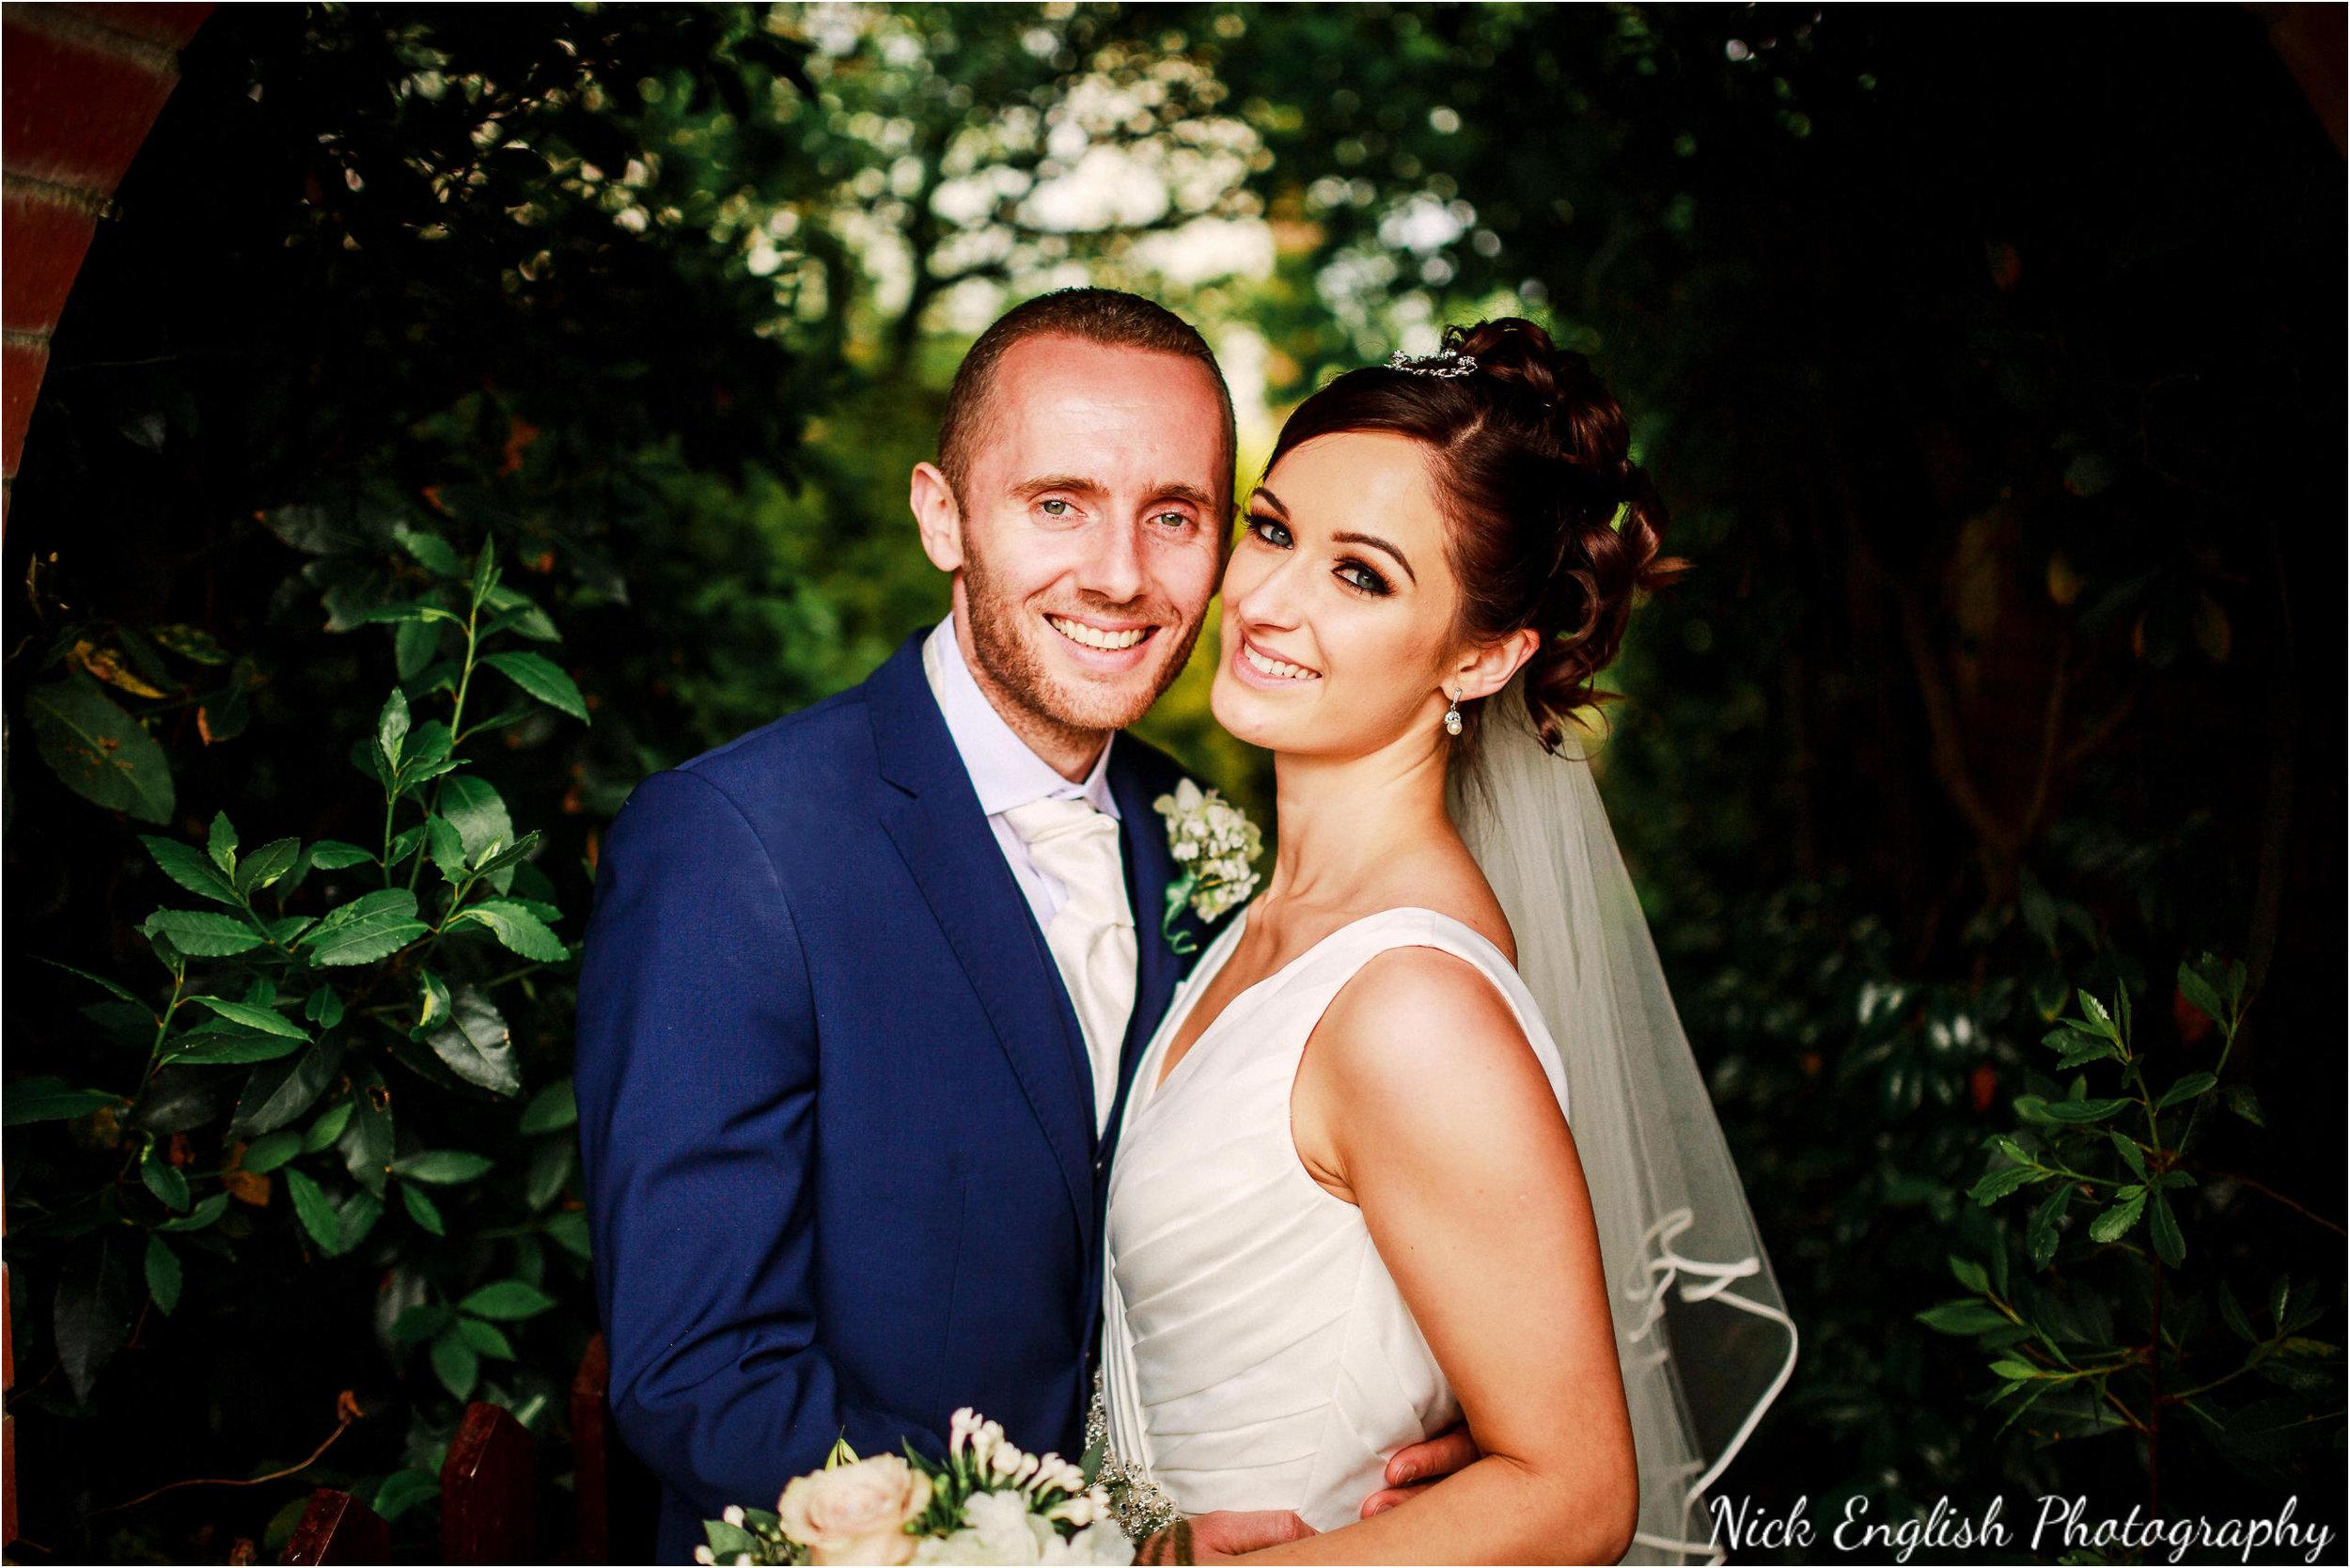 Emily David Wedding Photographs at Barton Grange Preston by Nick English Photography 148jpg.jpeg